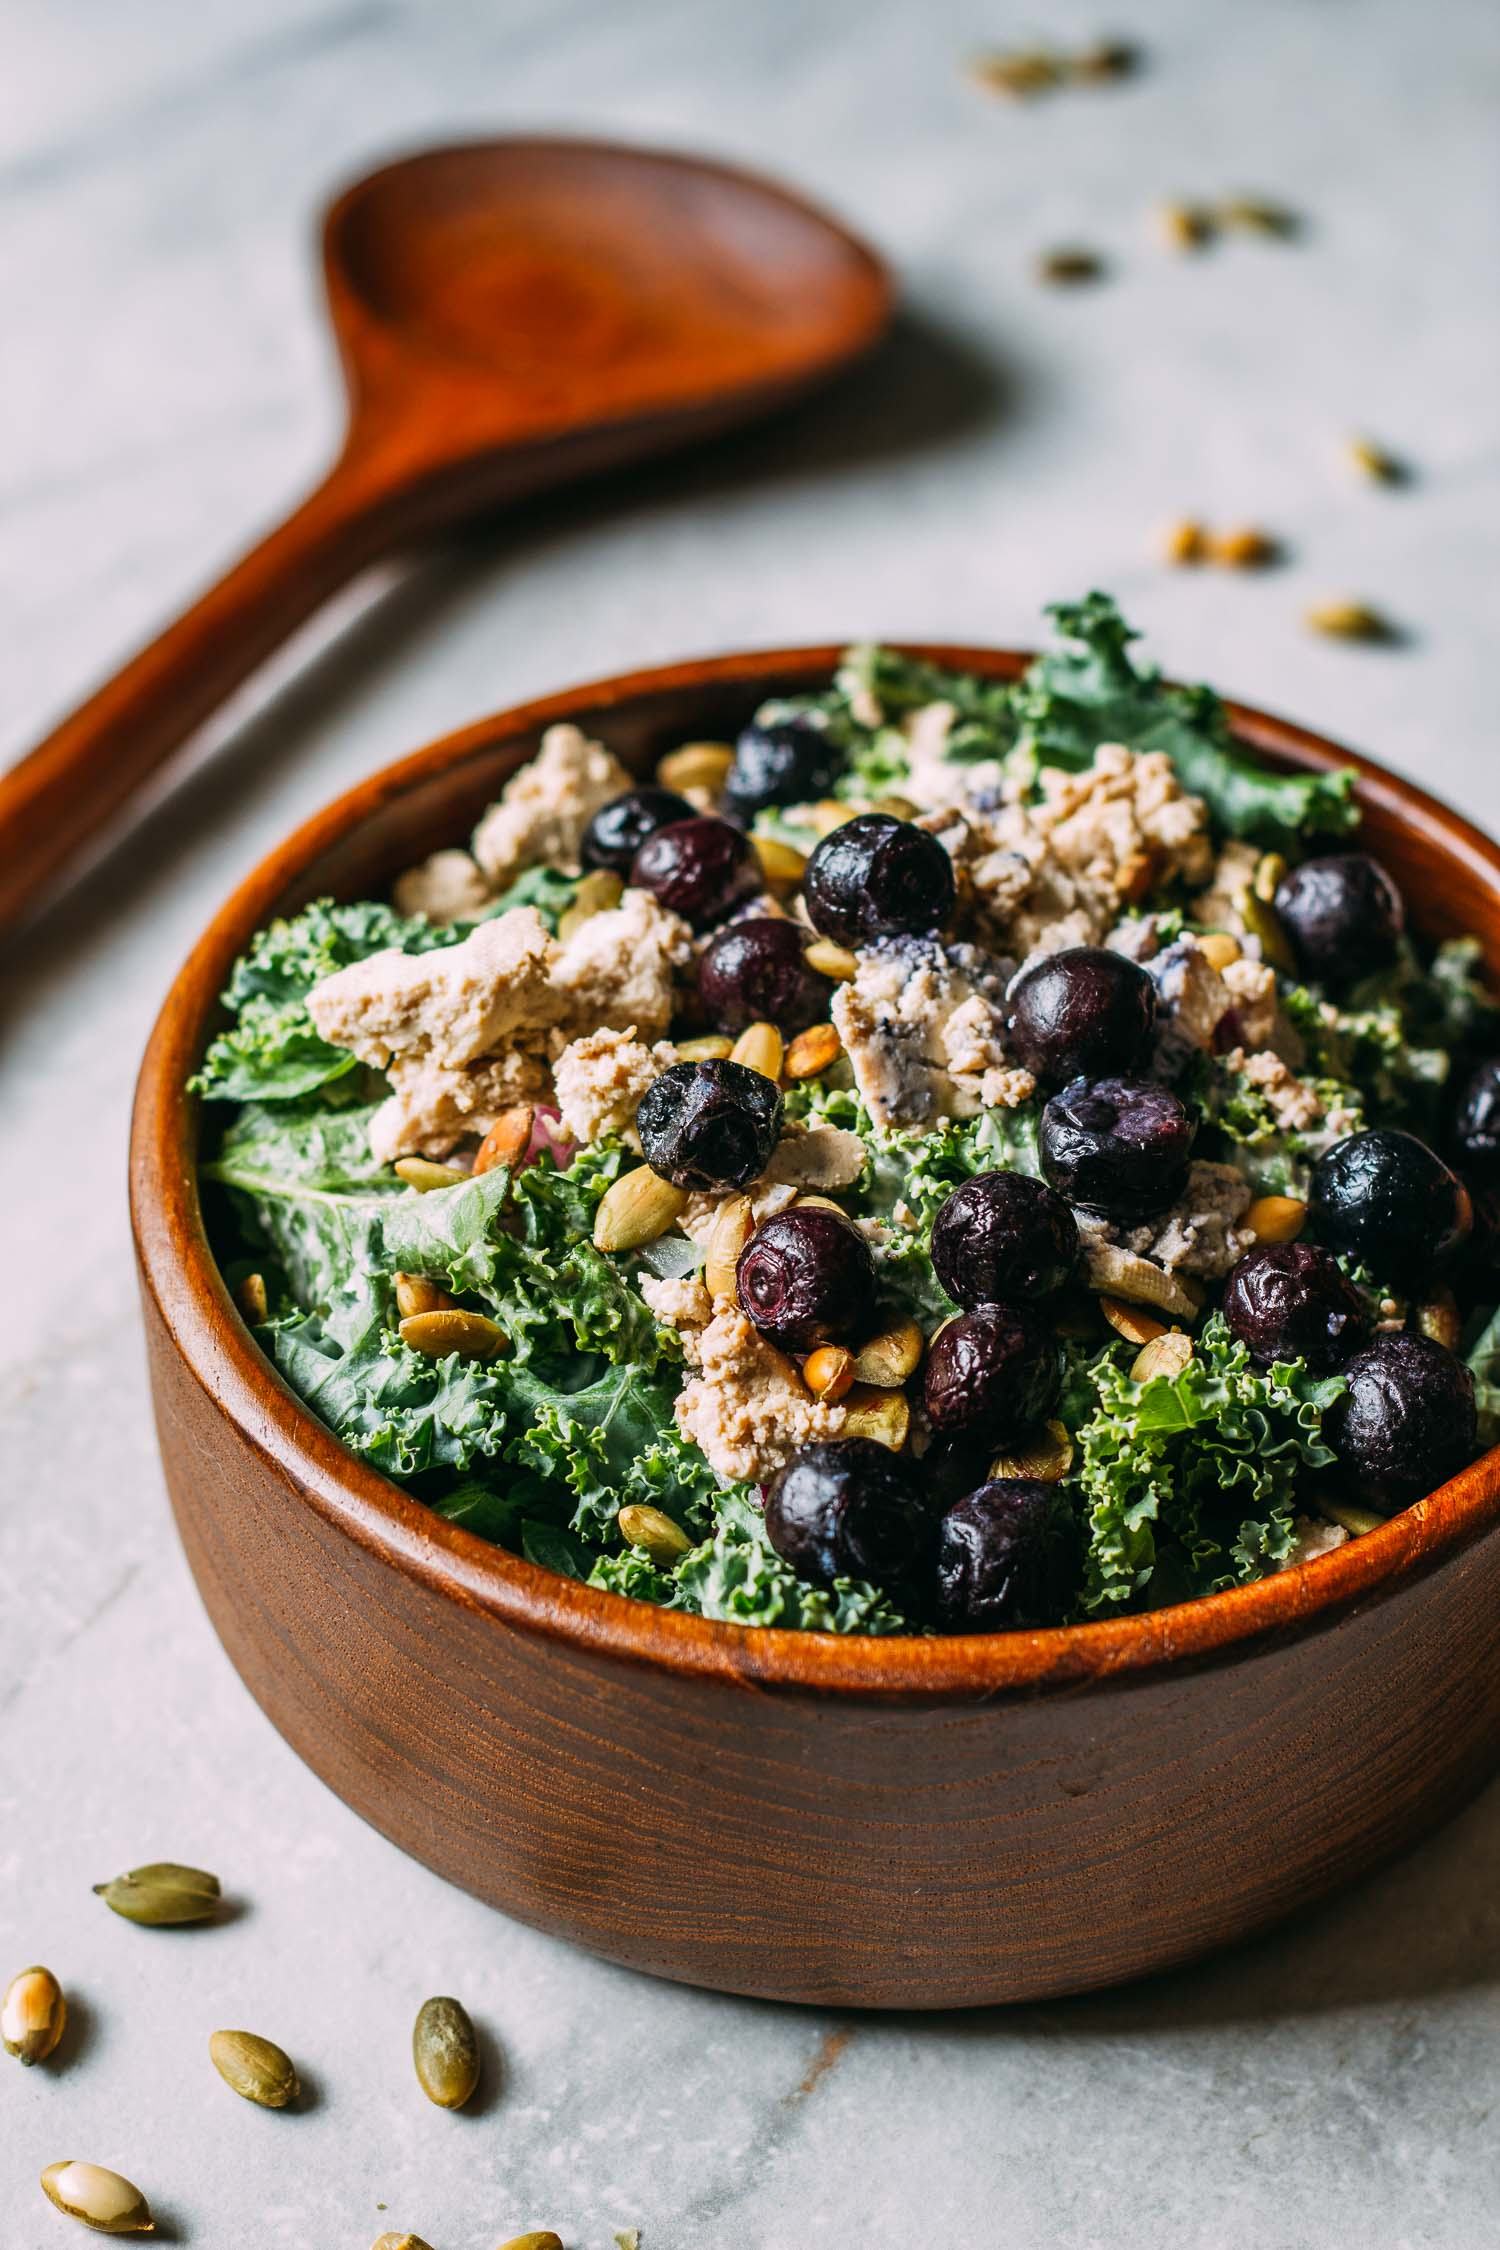 Blueberry Kale Pumpkin Seed Salad #vegetarian #vegan #oil-free #wfpb #wfpbno #recipe #kale #salad #cookout #easy #entertaining #holiday #buffet